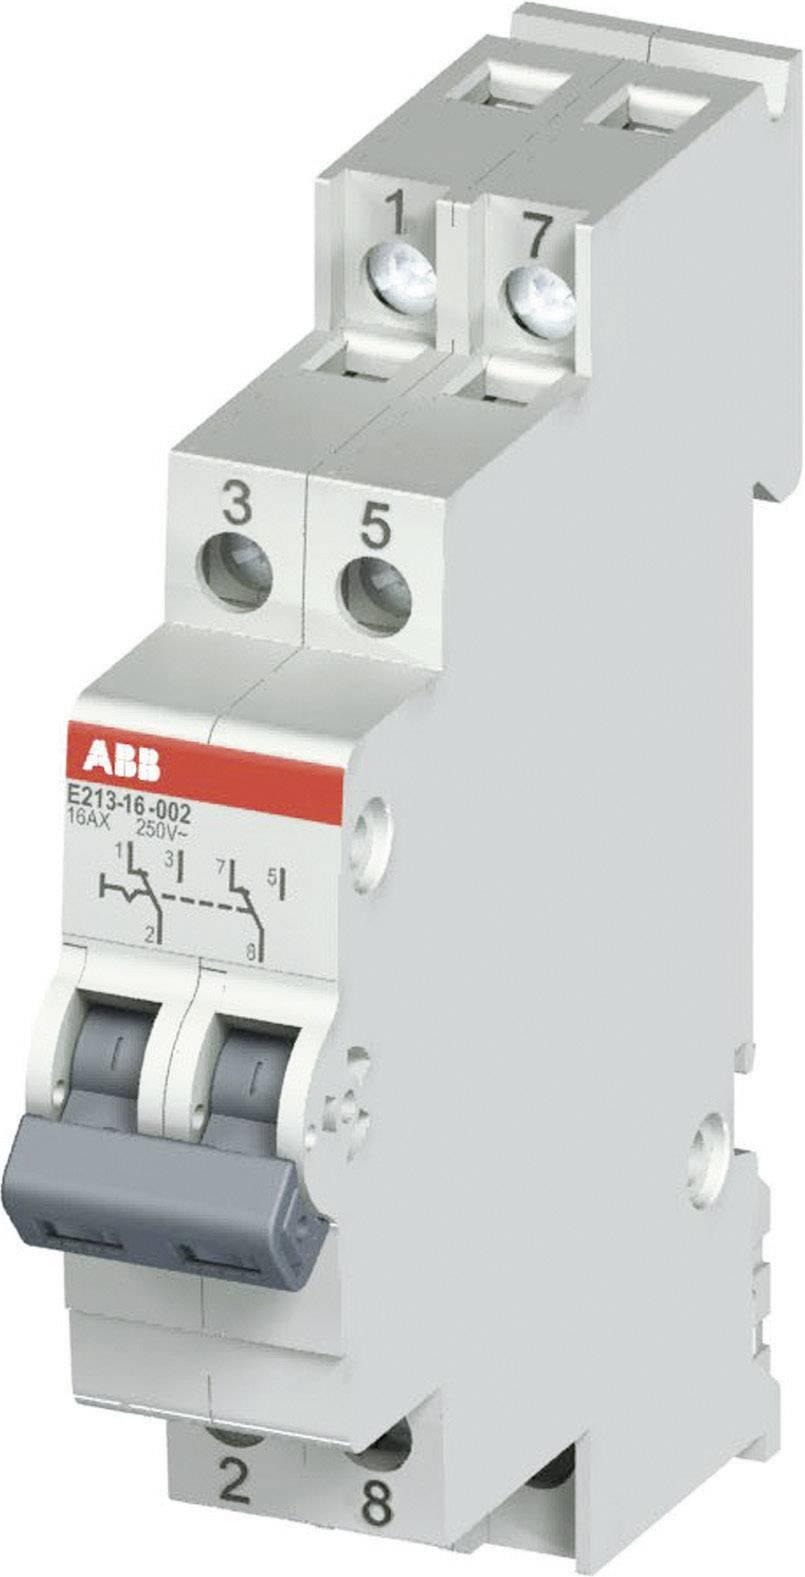 Vypínač na DIN lištu ABB E213 E213 25A-002, 25 A, 250 V, 2 C/O, 2CCA703046R0001